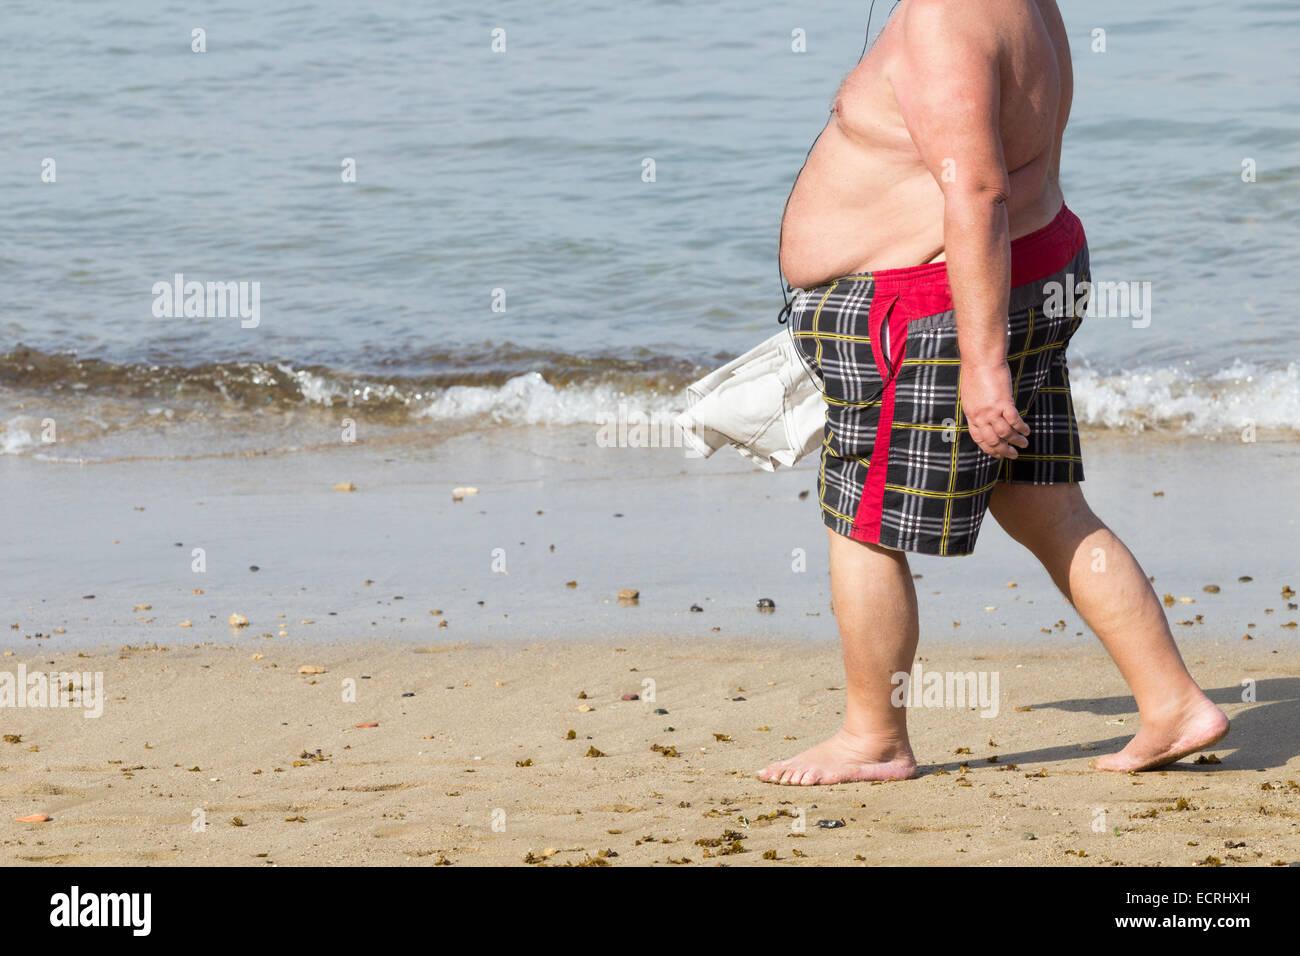 obese-man-walking-on-beach-ECRHXH.jpg